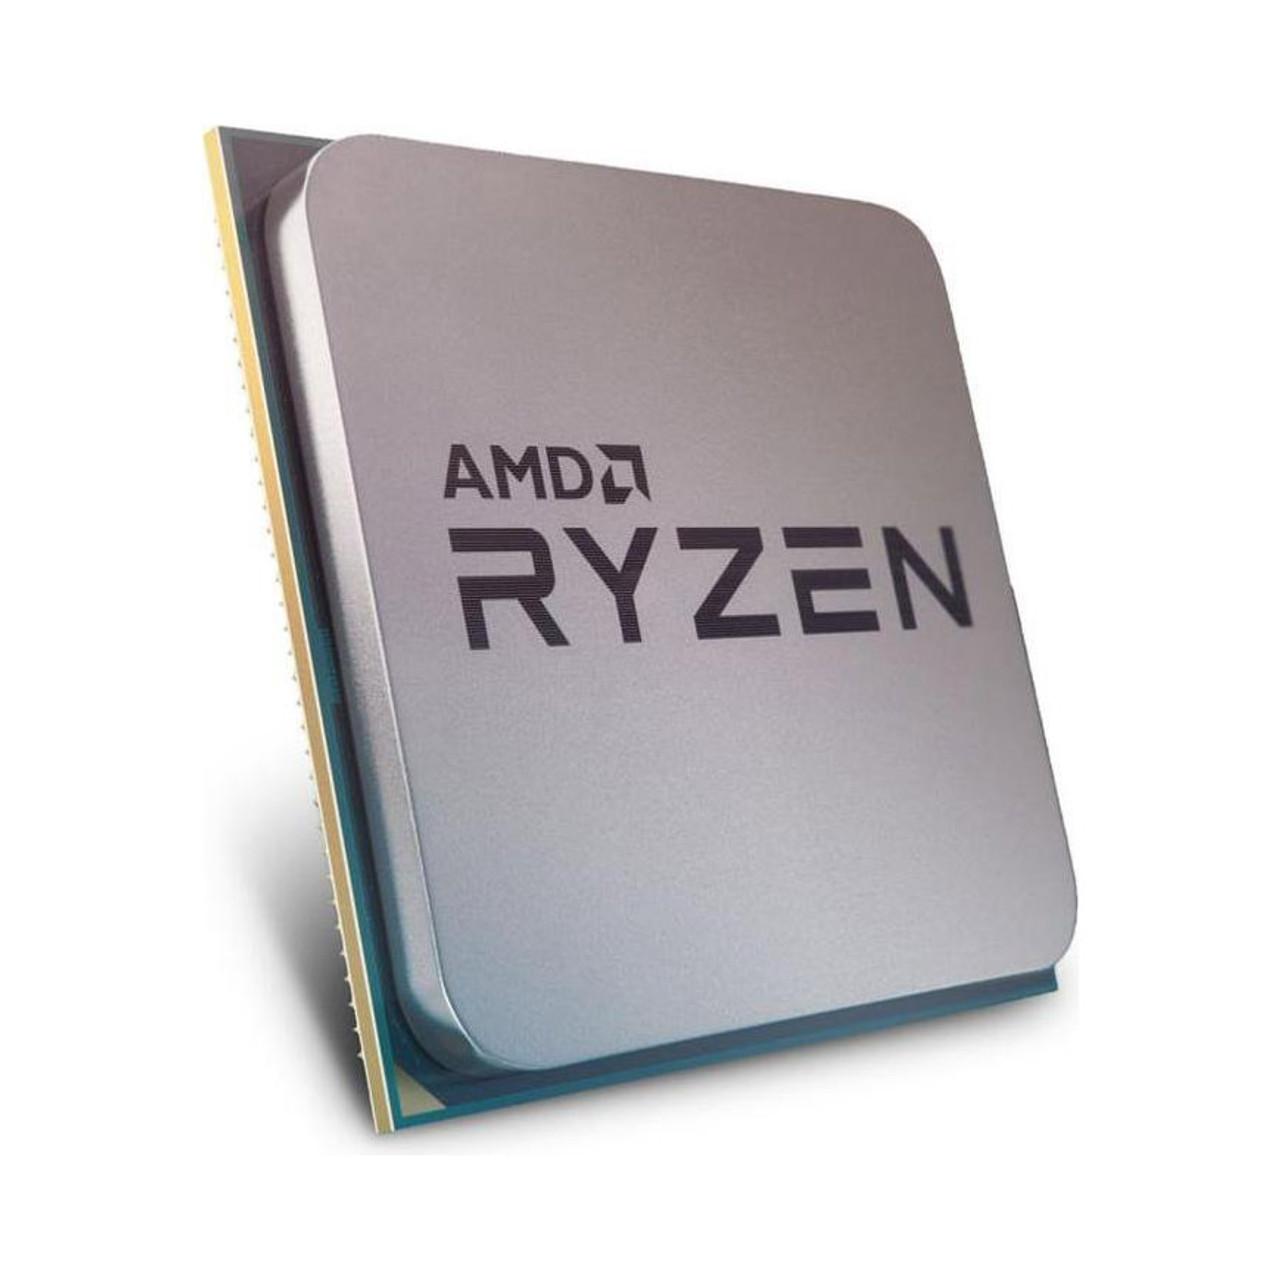 Yd1600bbm6iae Amd Ryzen 5 1600 3 20ghz Am4 Desktop Cpu